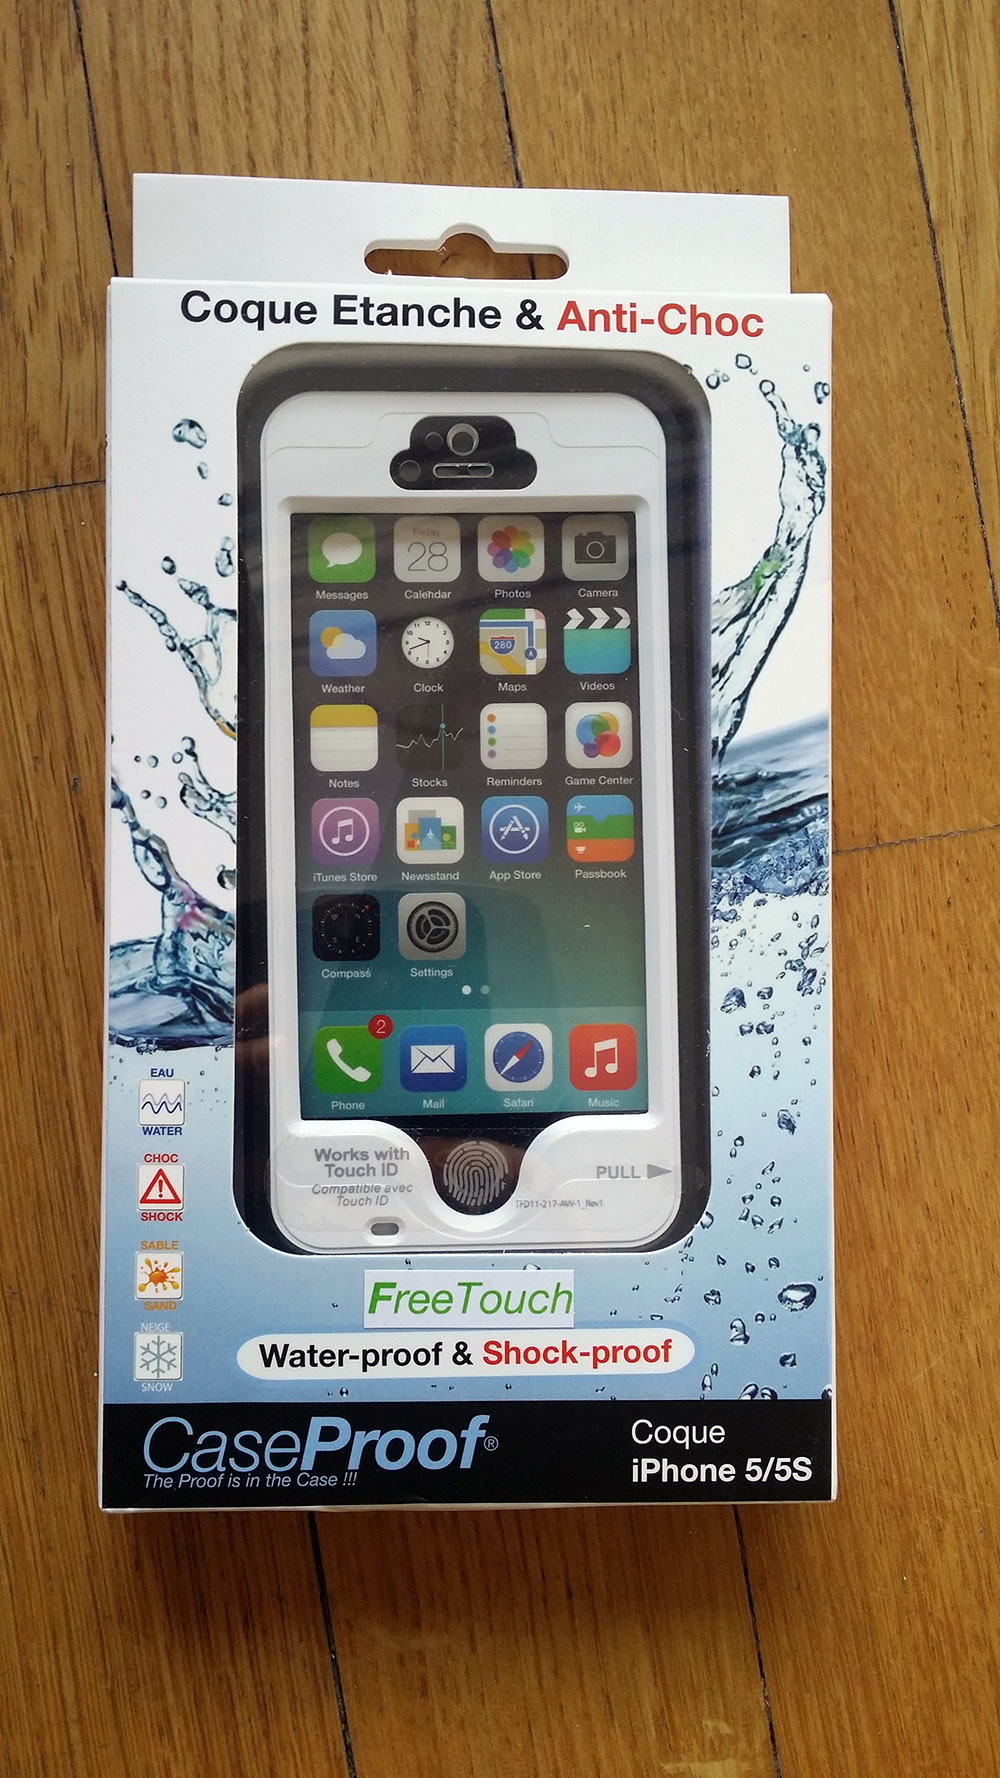 coque-etanche-anti-choc-free-touch-caseproof-1